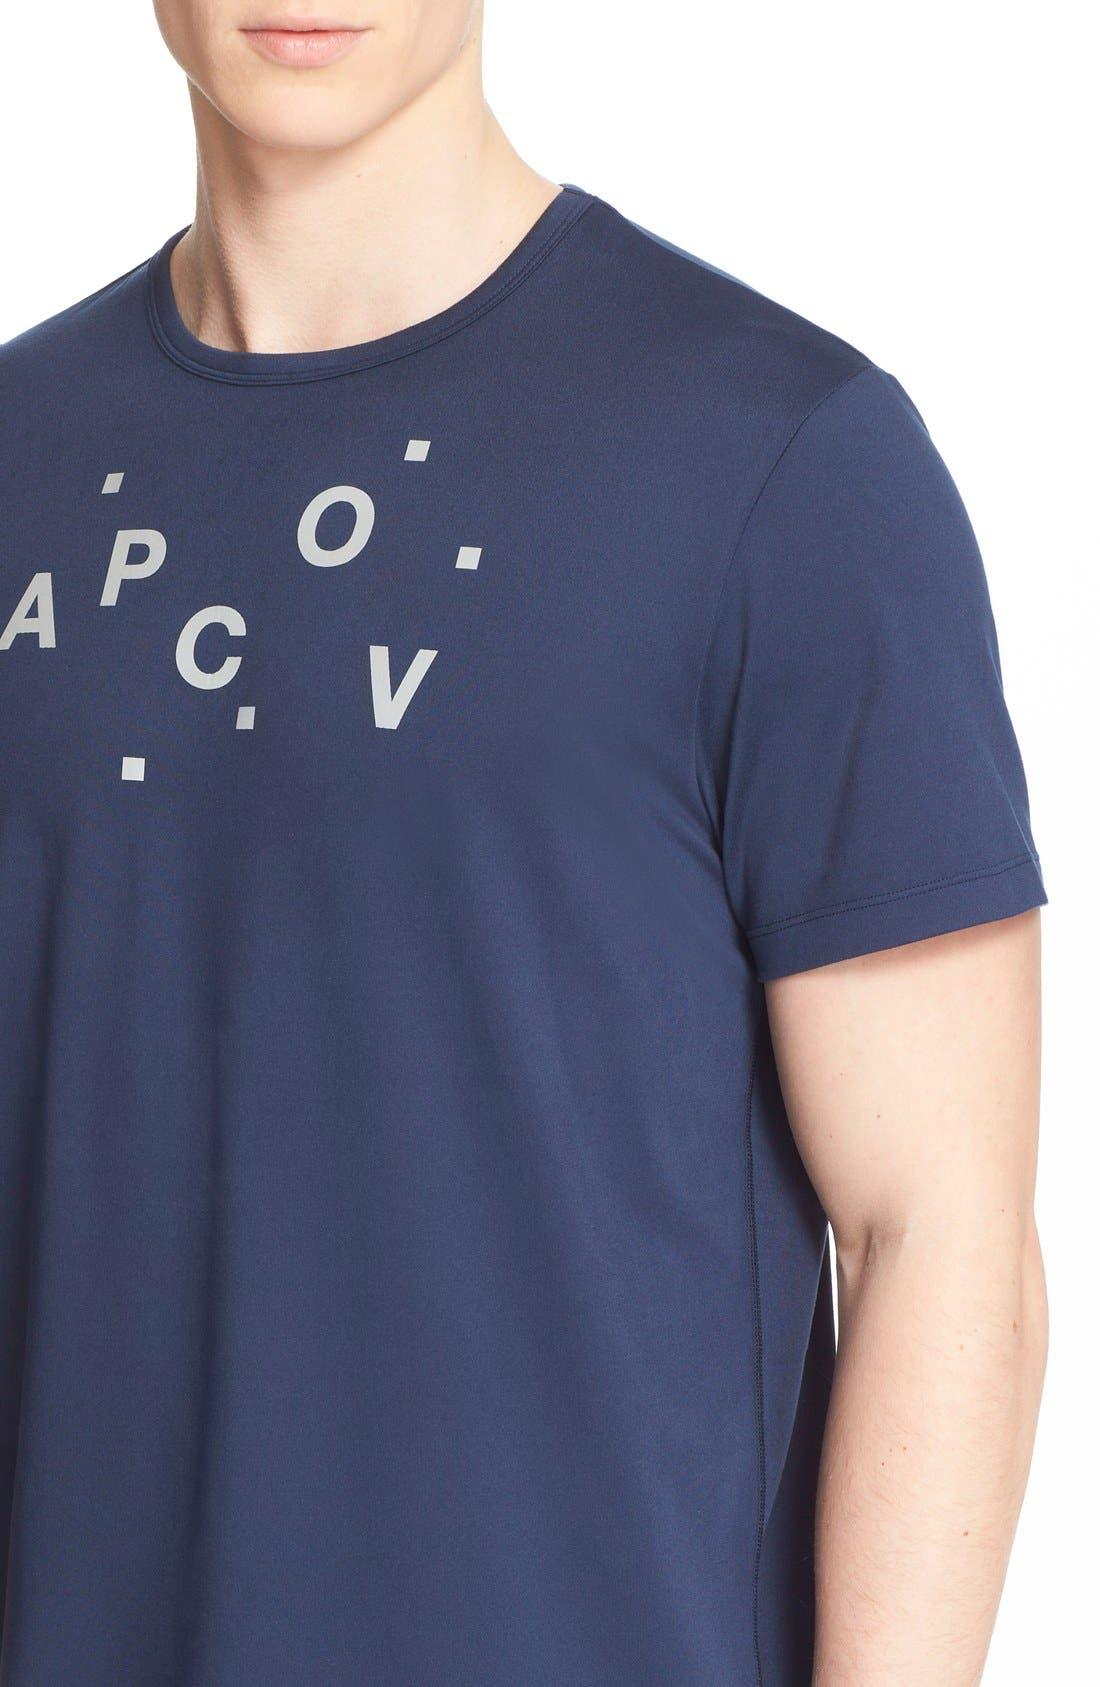 and Outdoor Voices 'Austin' Crewneck Logo T-Shirt,                             Alternate thumbnail 4, color,                             410